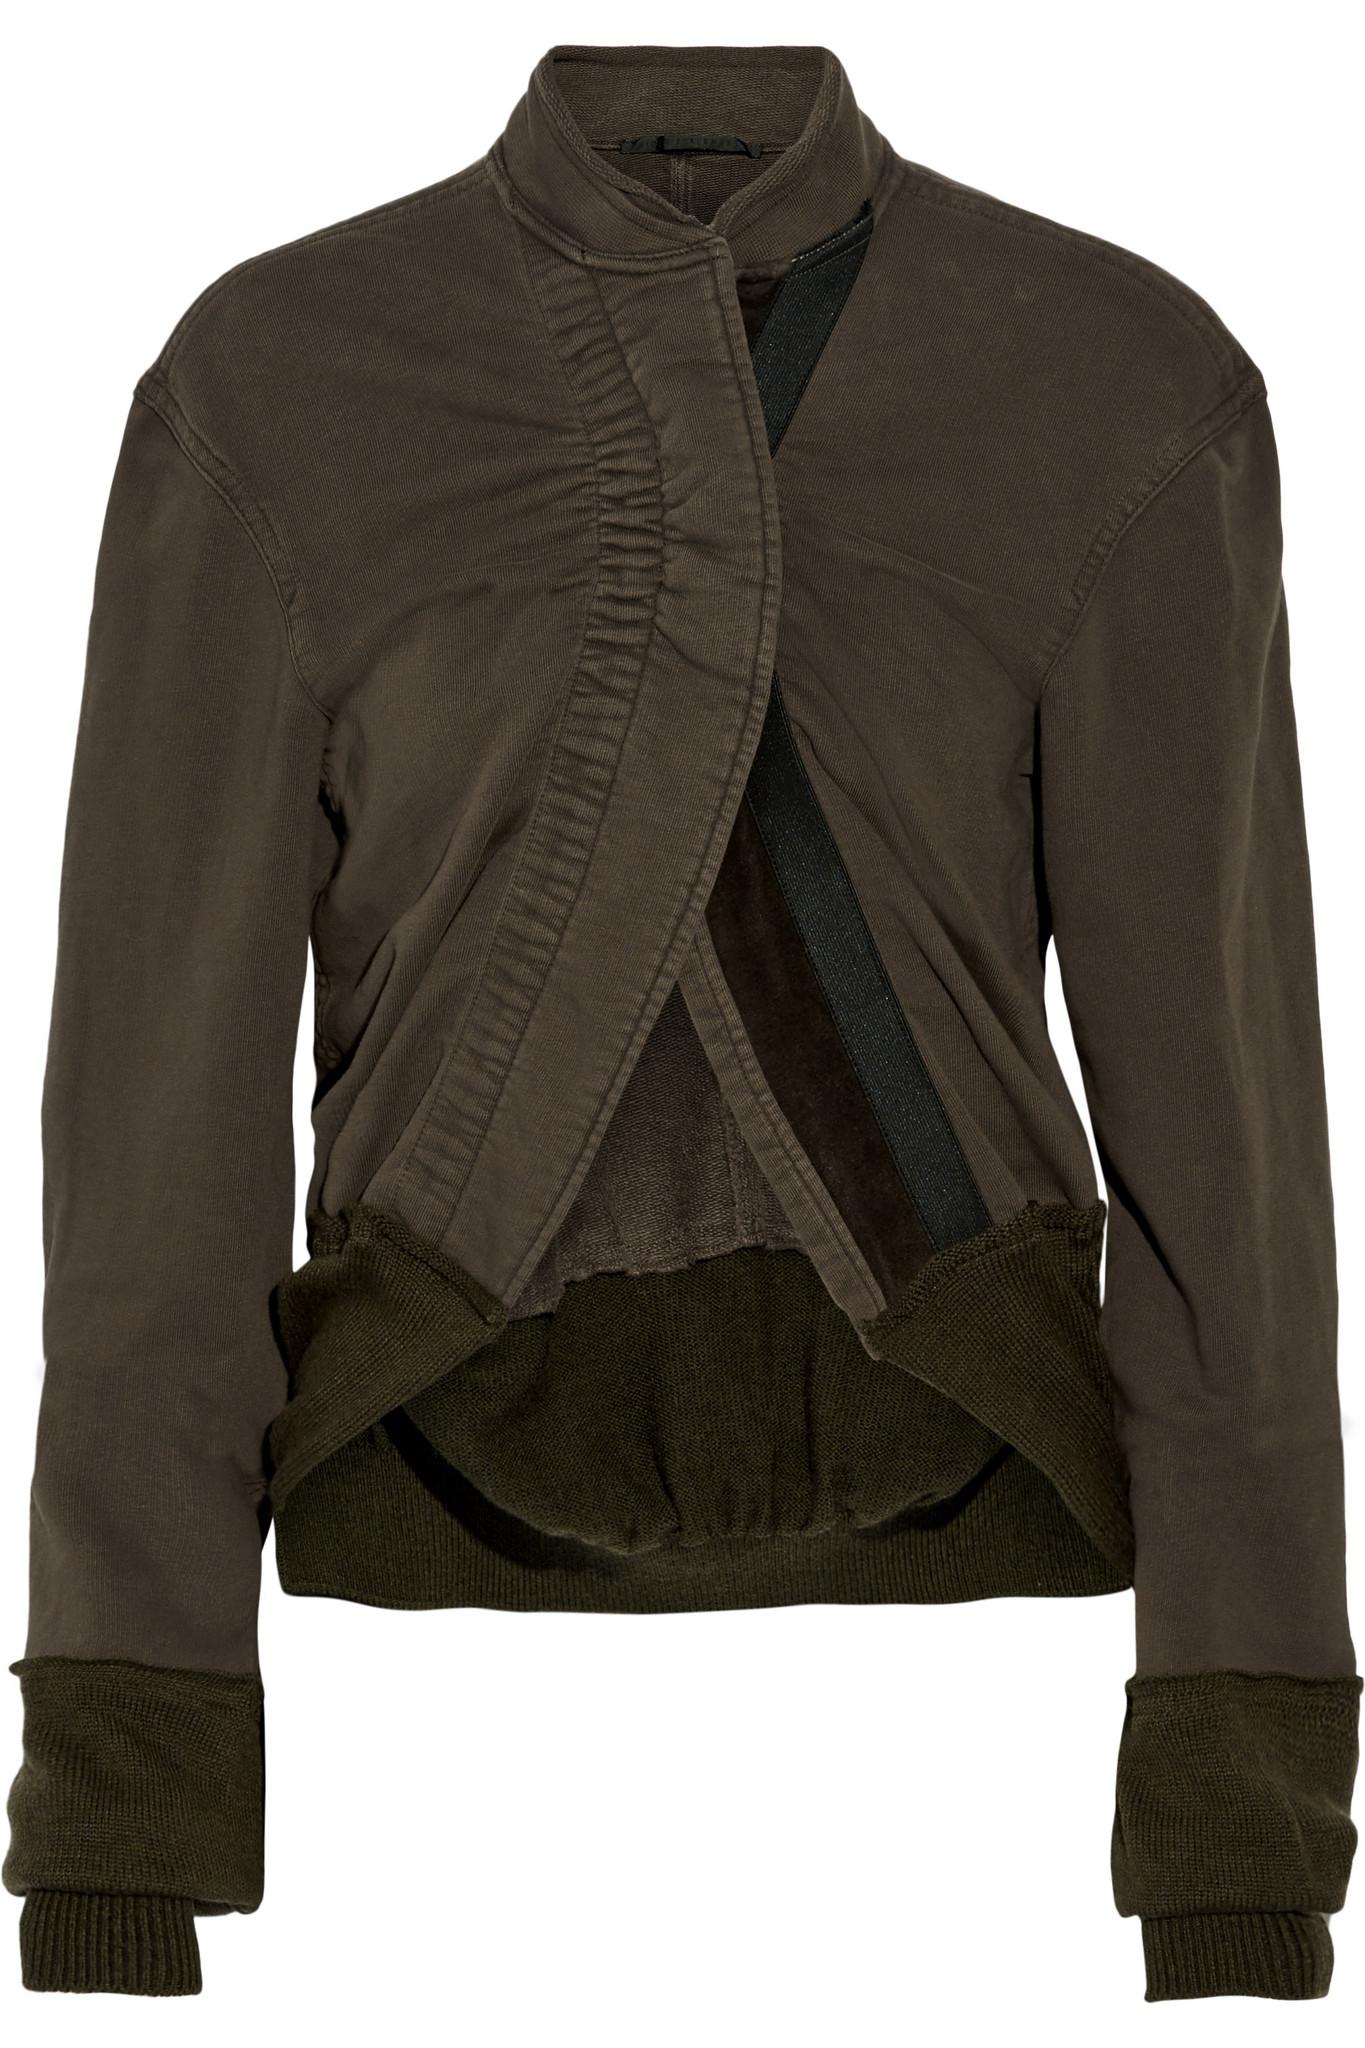 Haider Ackermann Paneled Cotton-jersey Jacket in Green